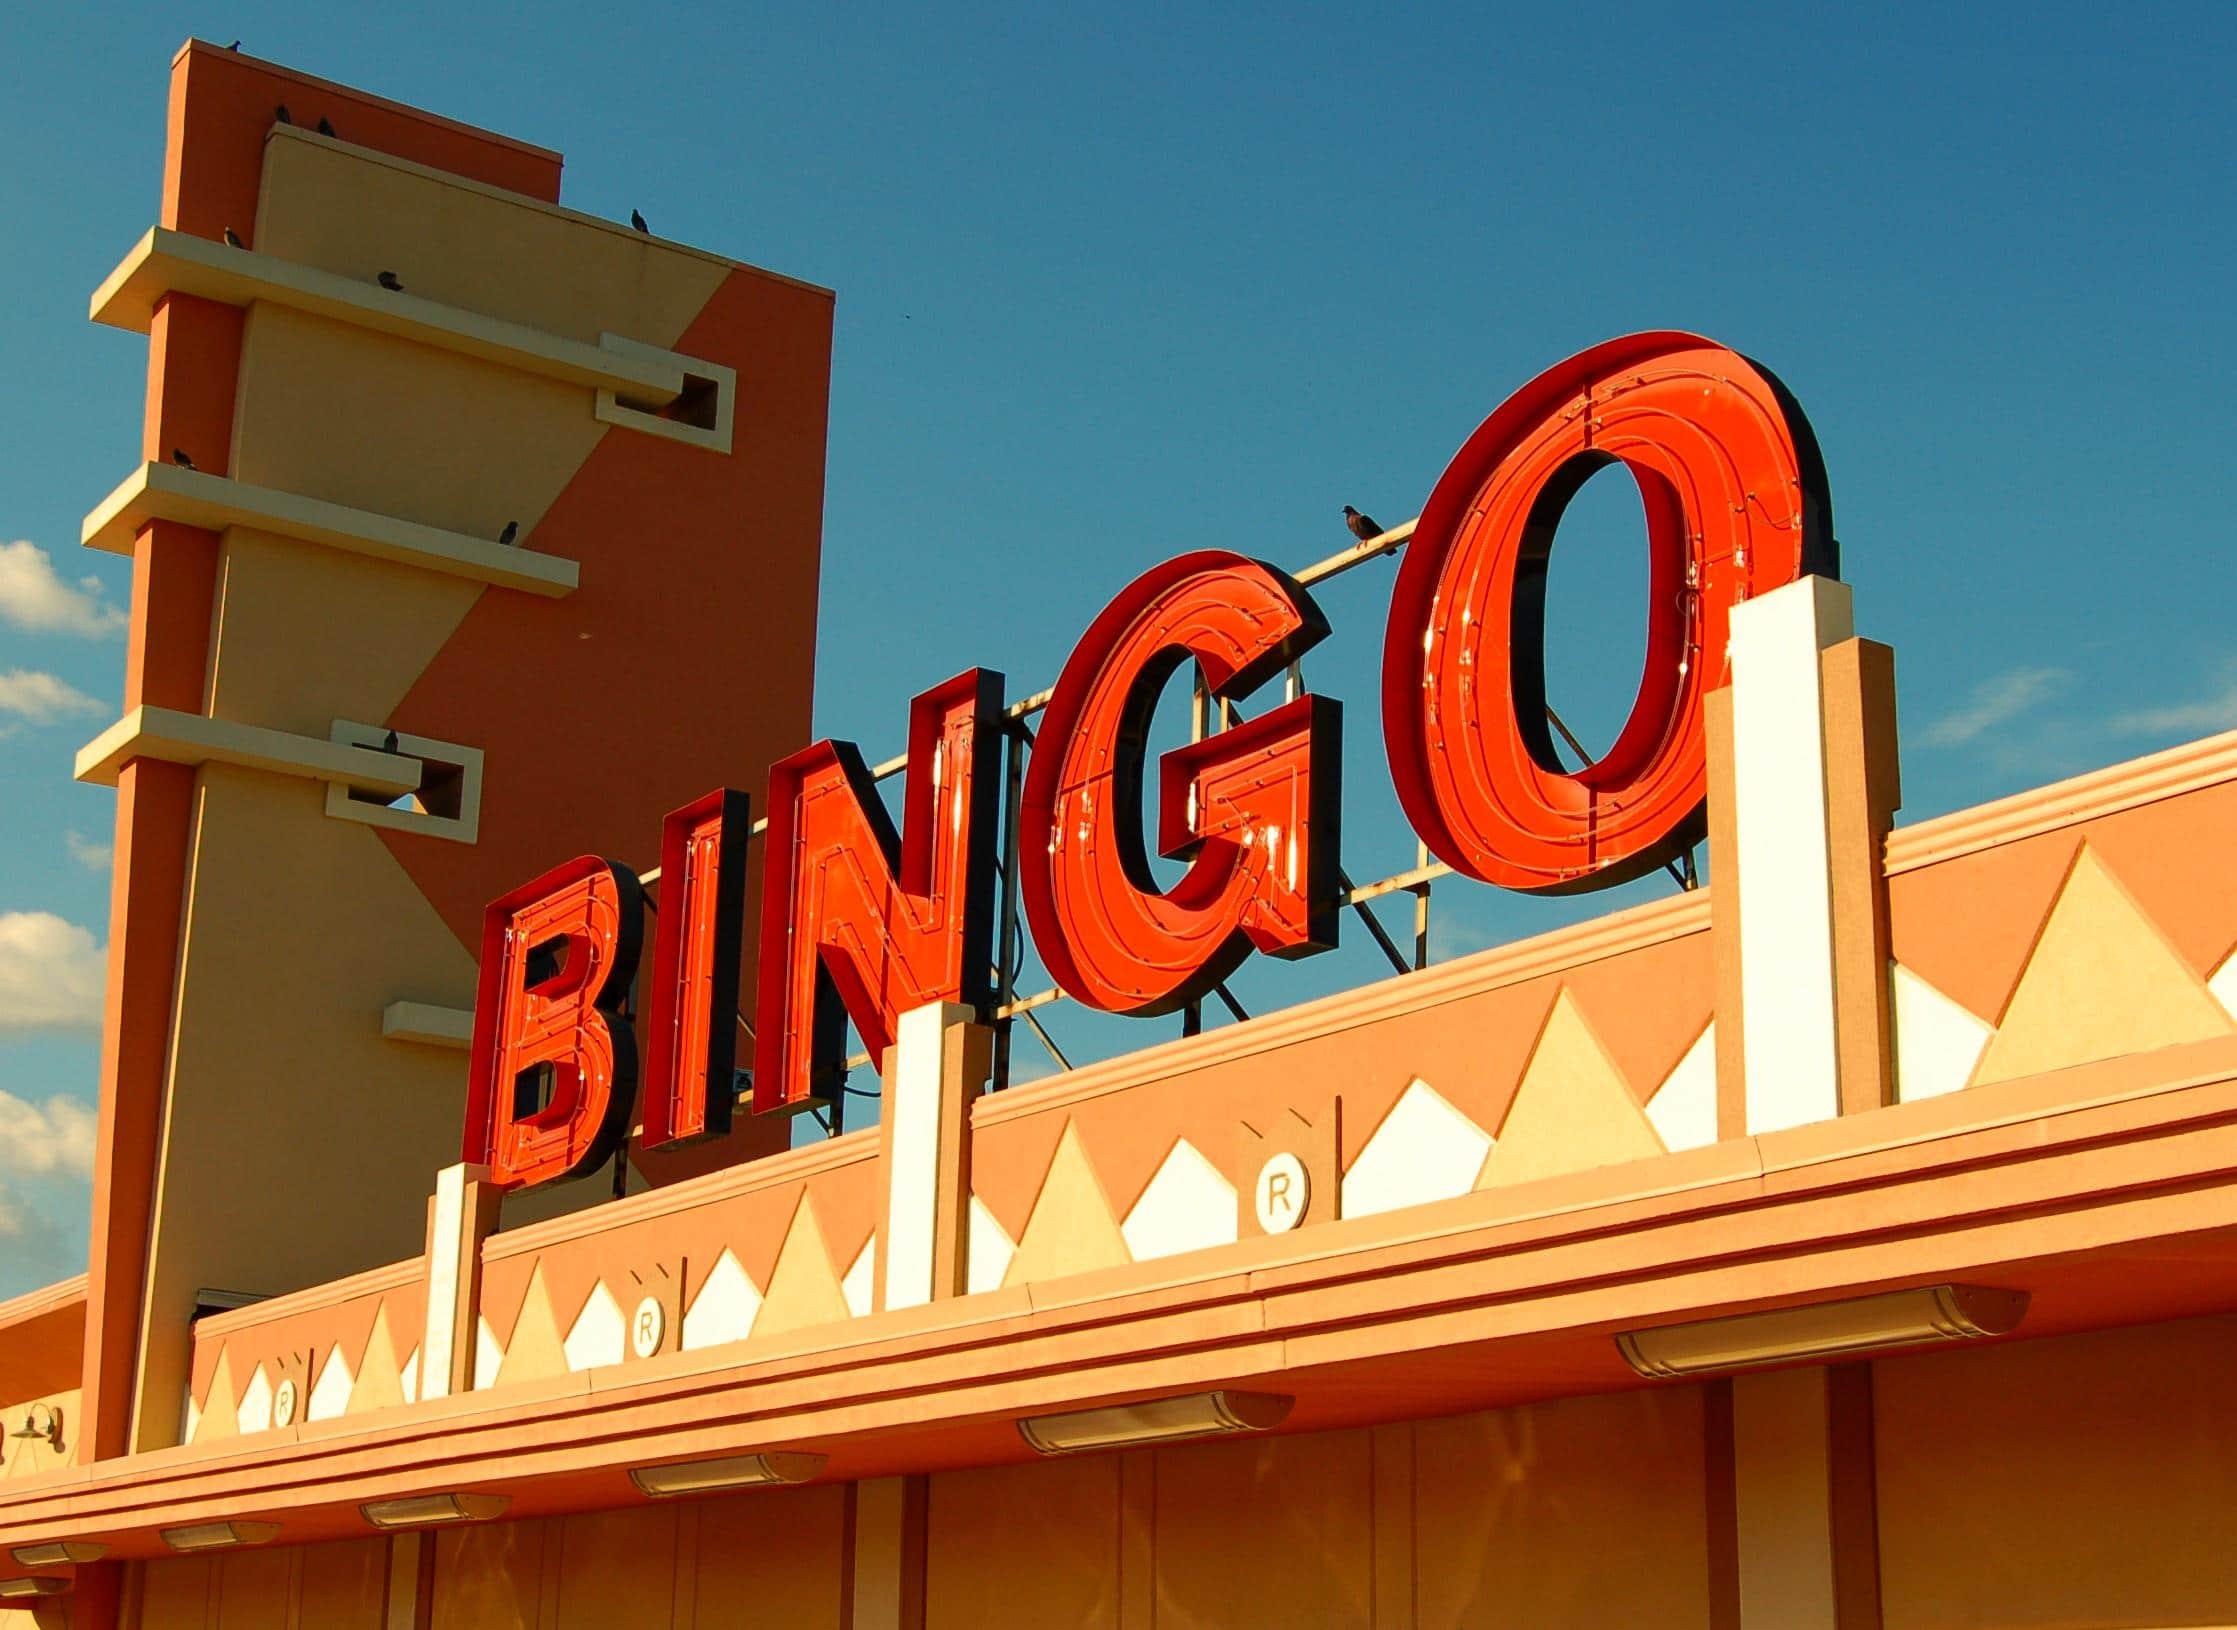 bingo-sign